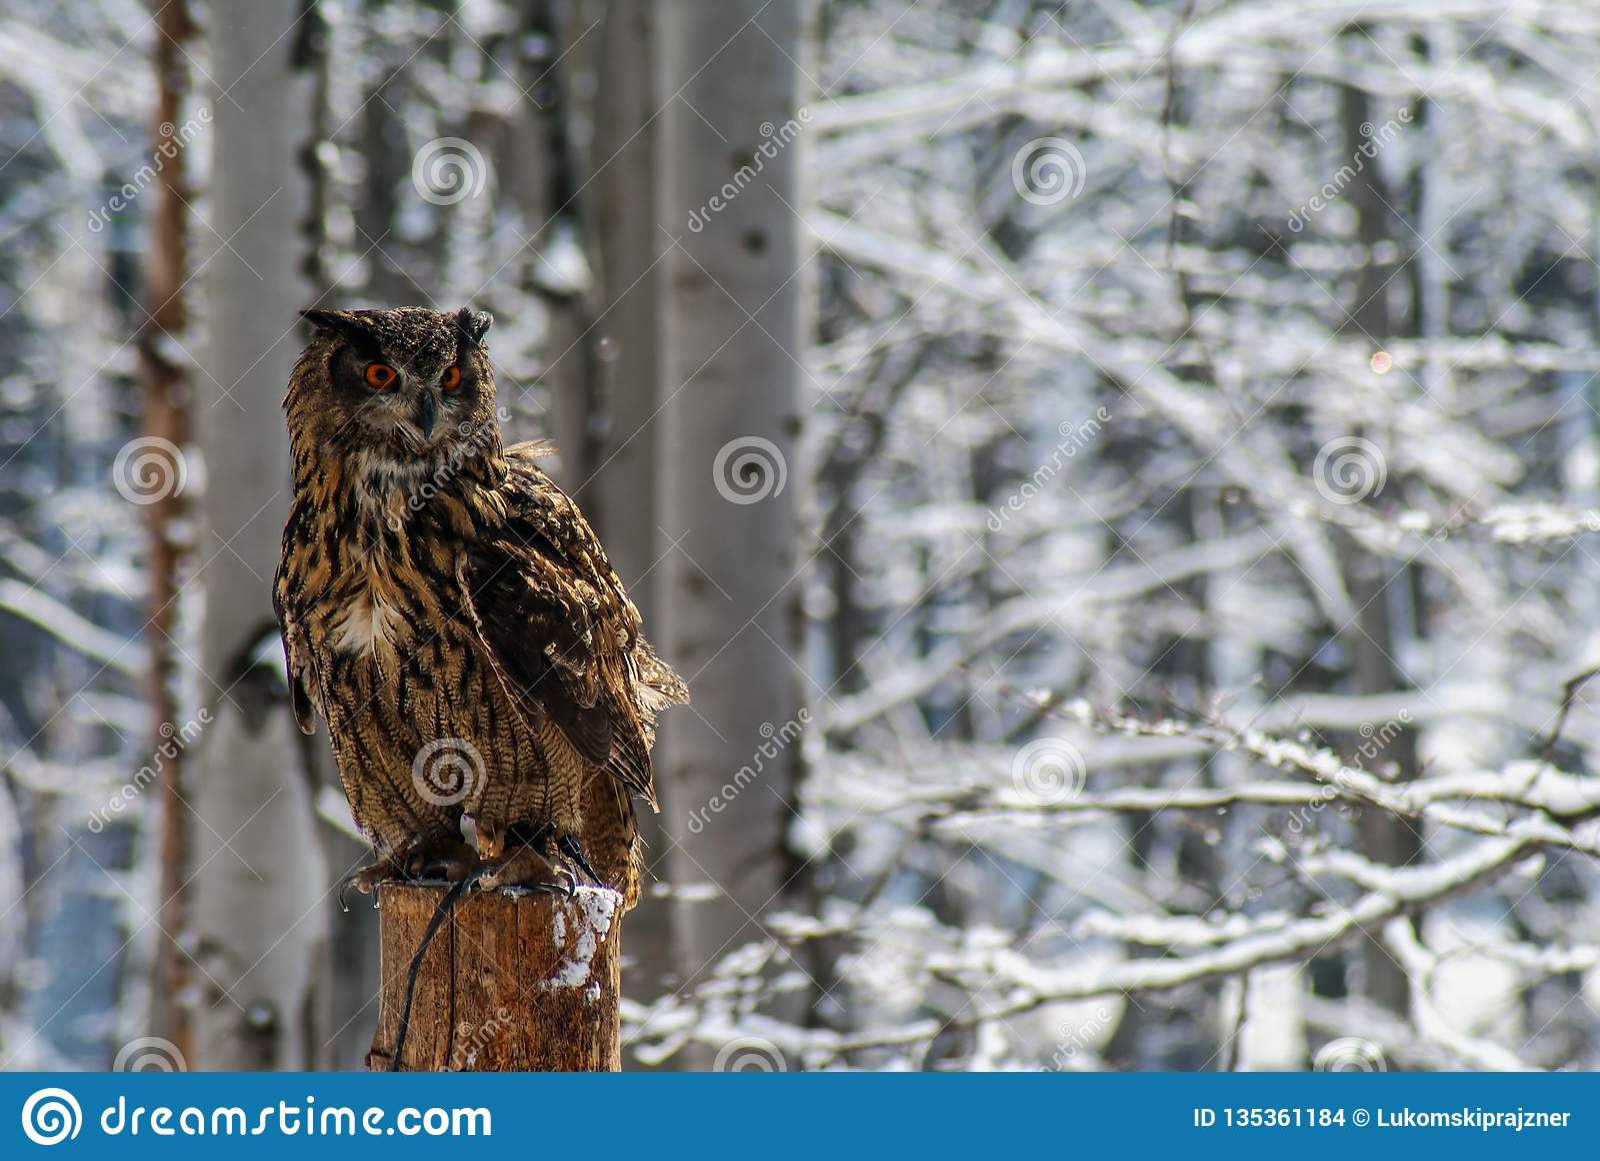 De eagle-uil van Bubobubo